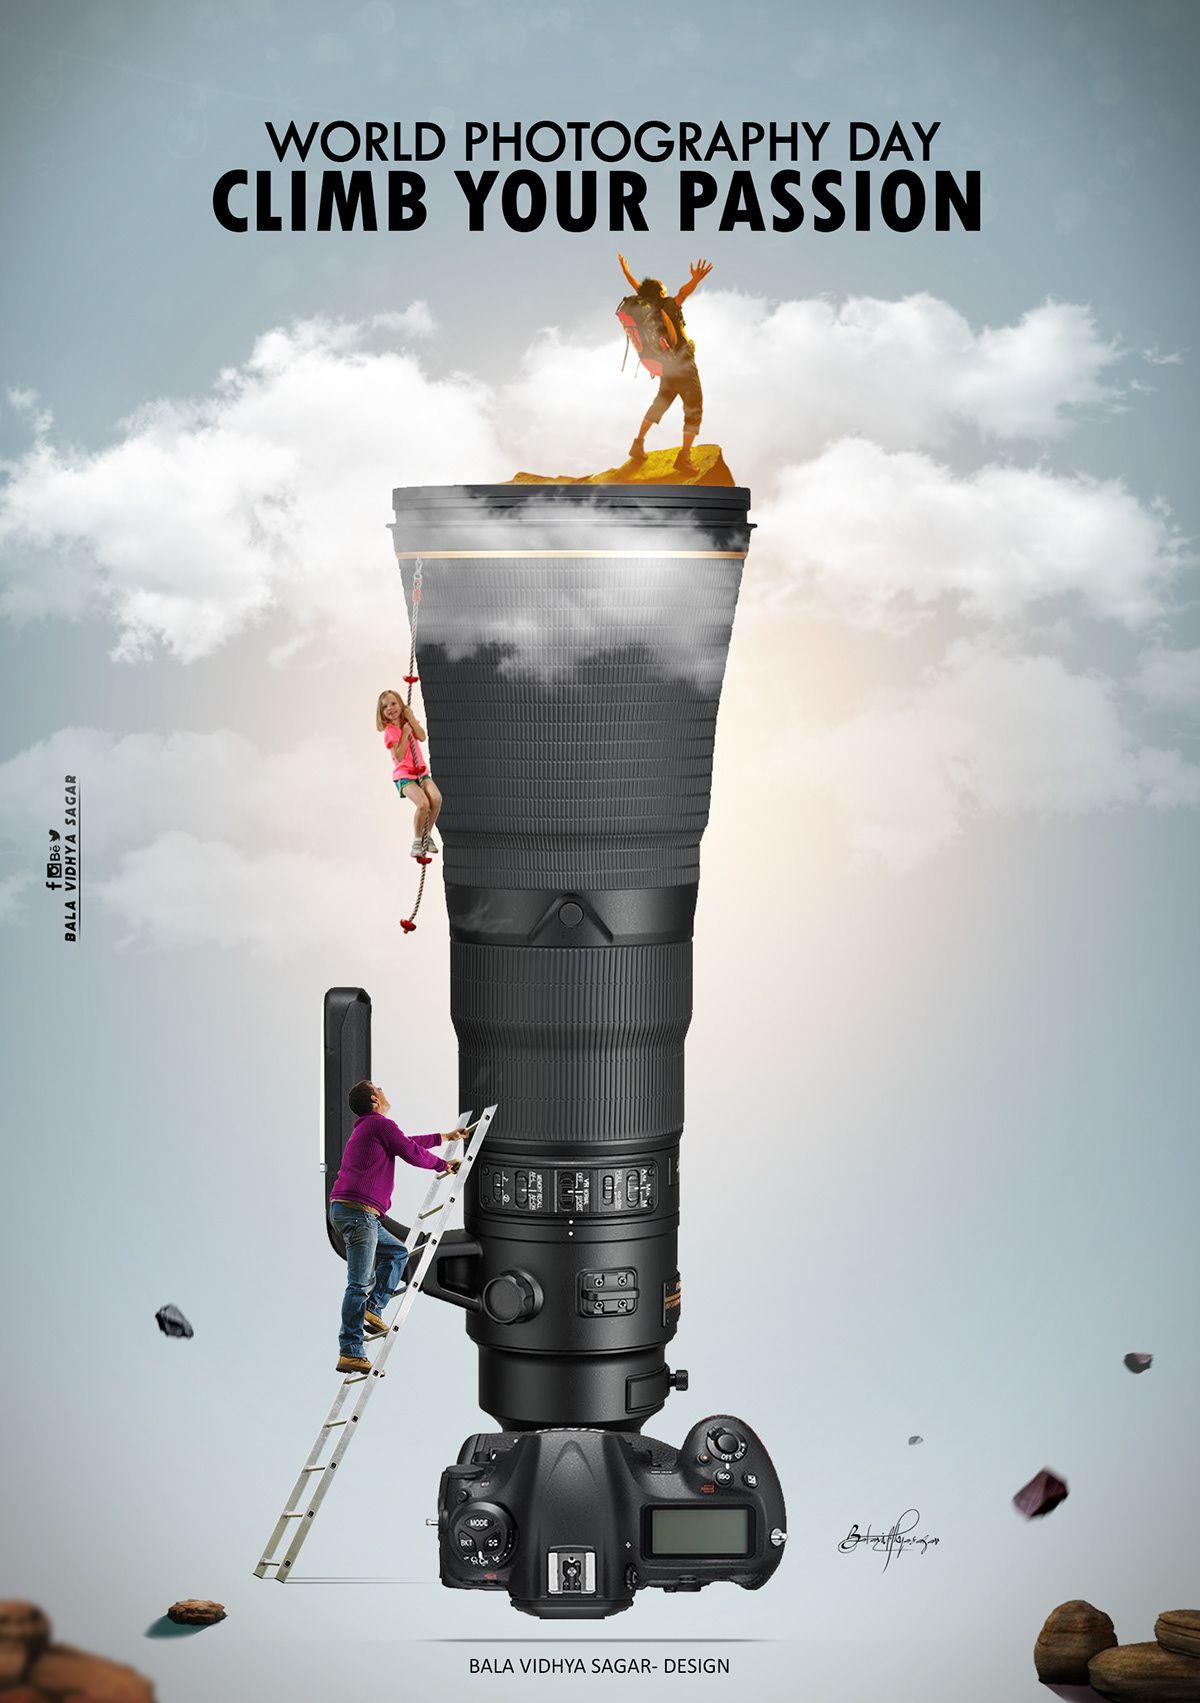 World Photography Day 2019 Manipulation On Behance In 2020 World Photography Day World Photography Photography Day